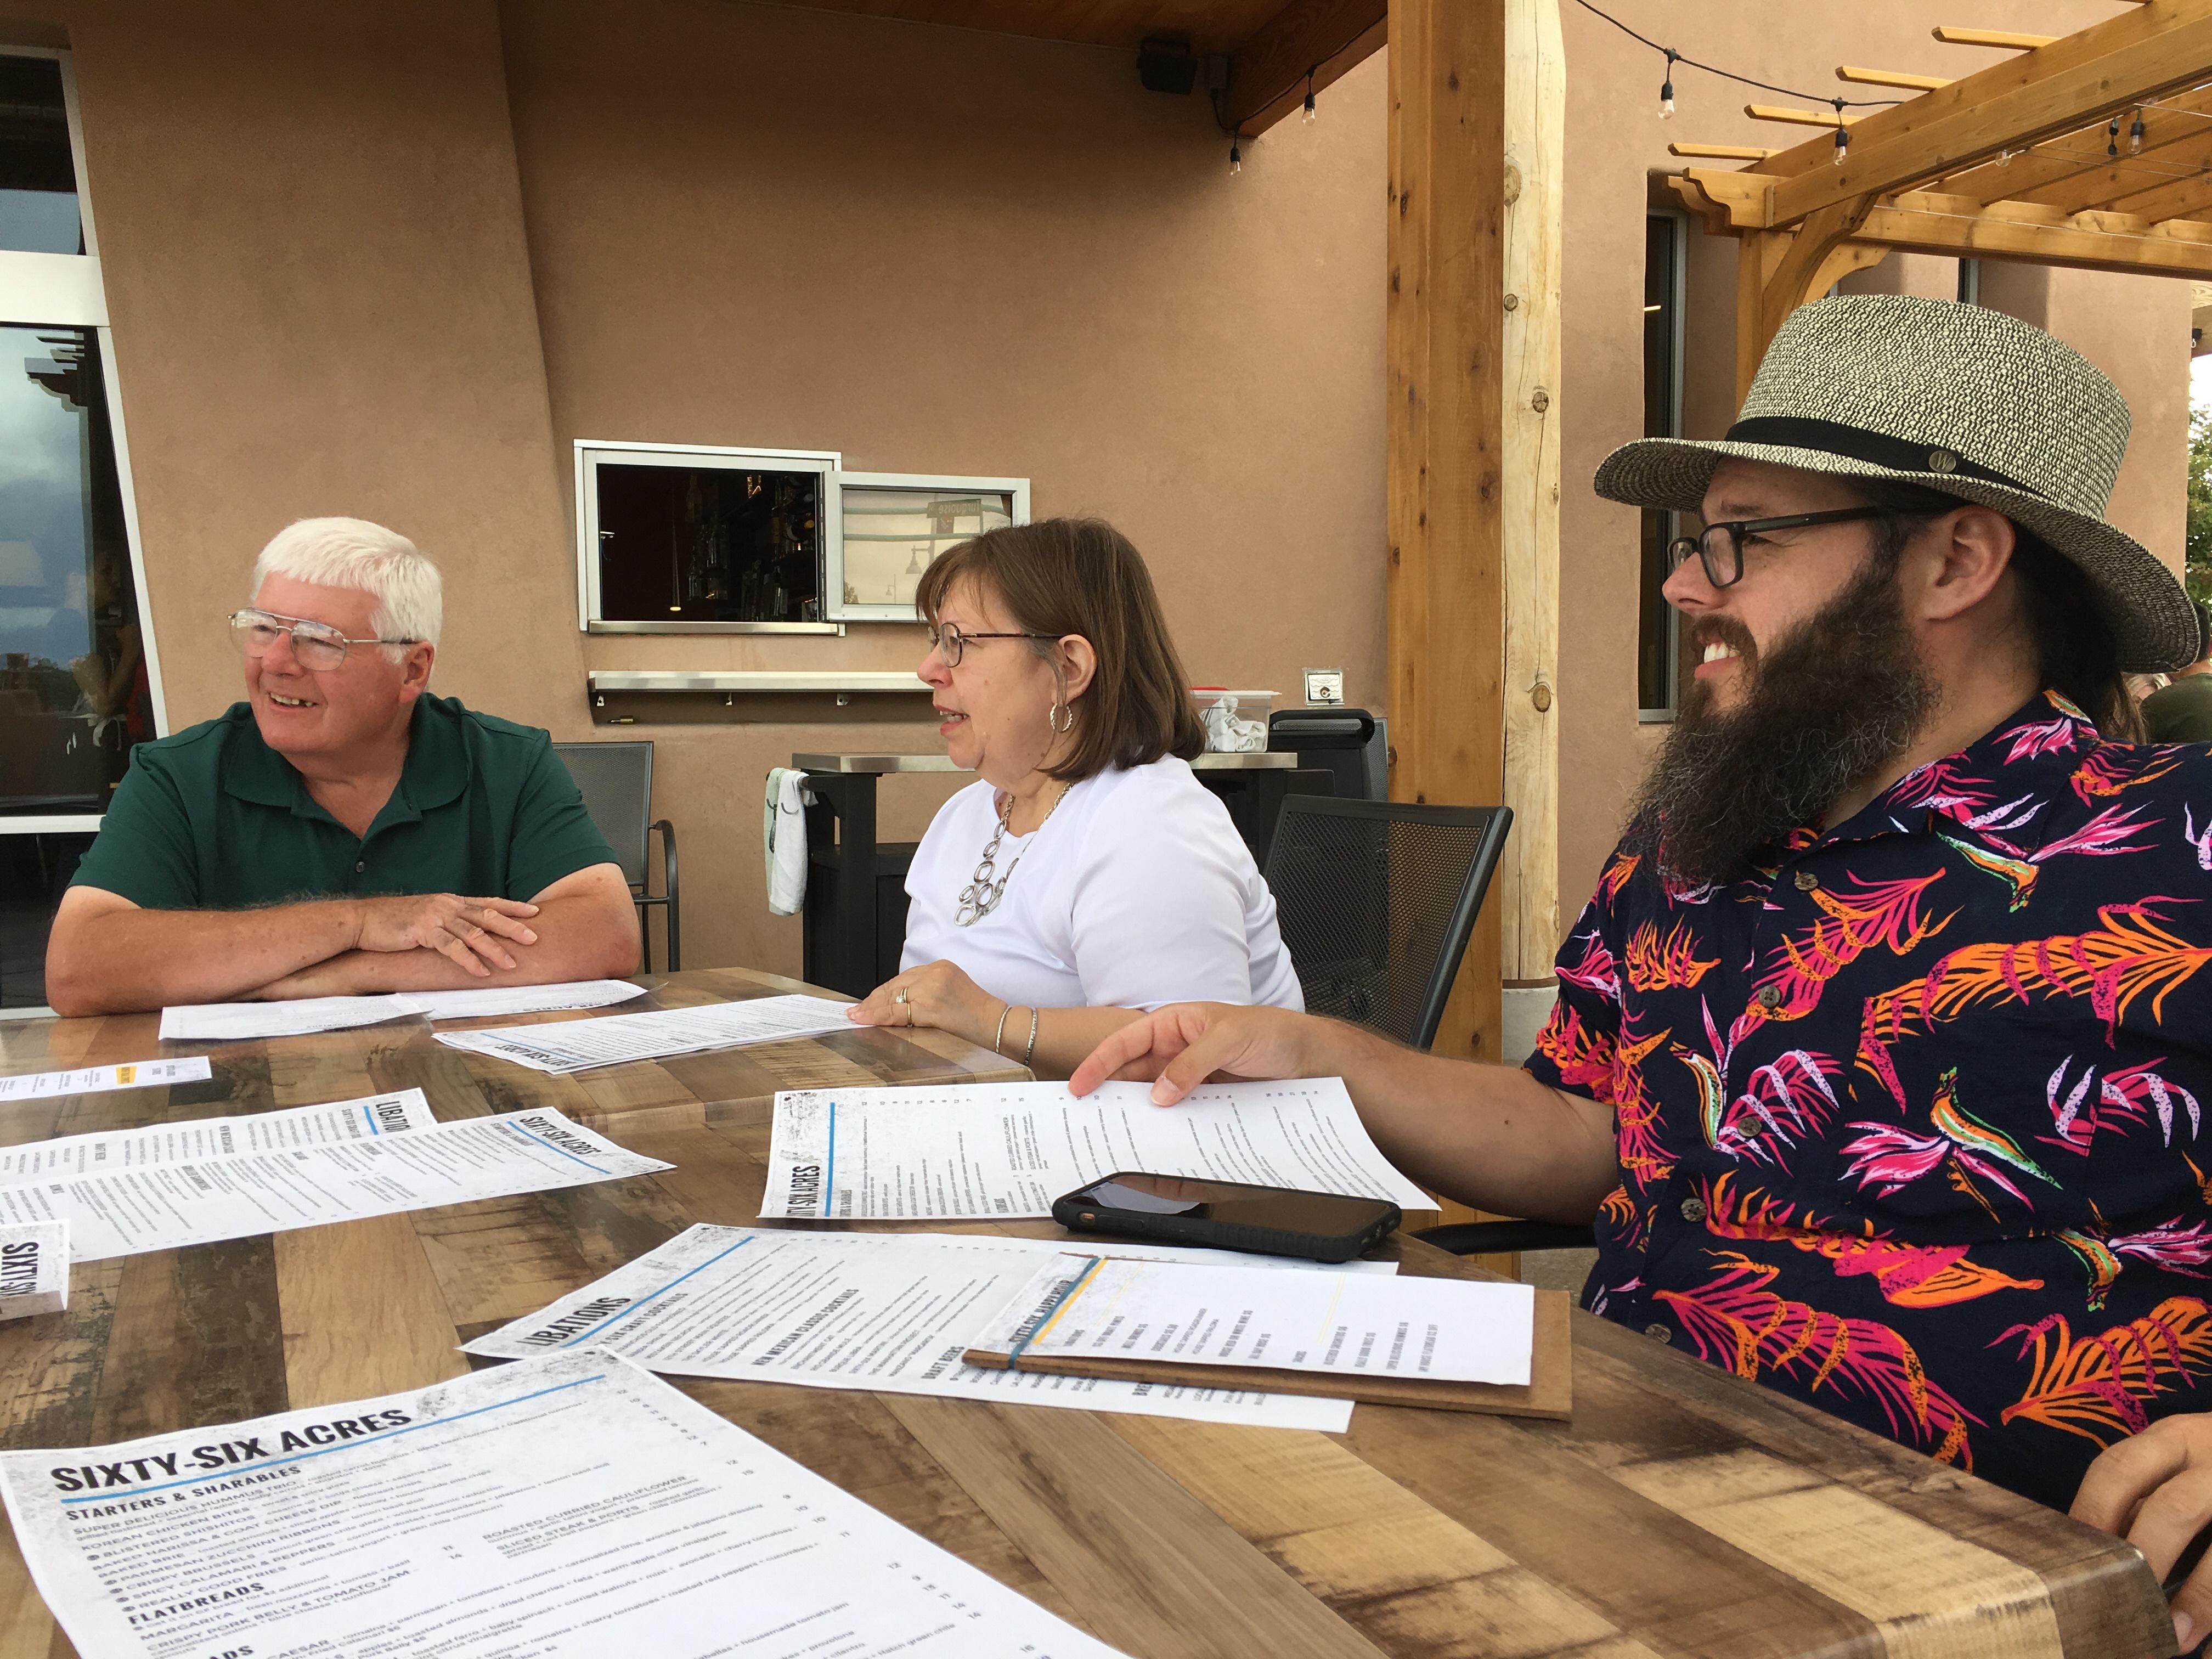 Albuquerque, New Mexico | Ross and Jamie Adventure